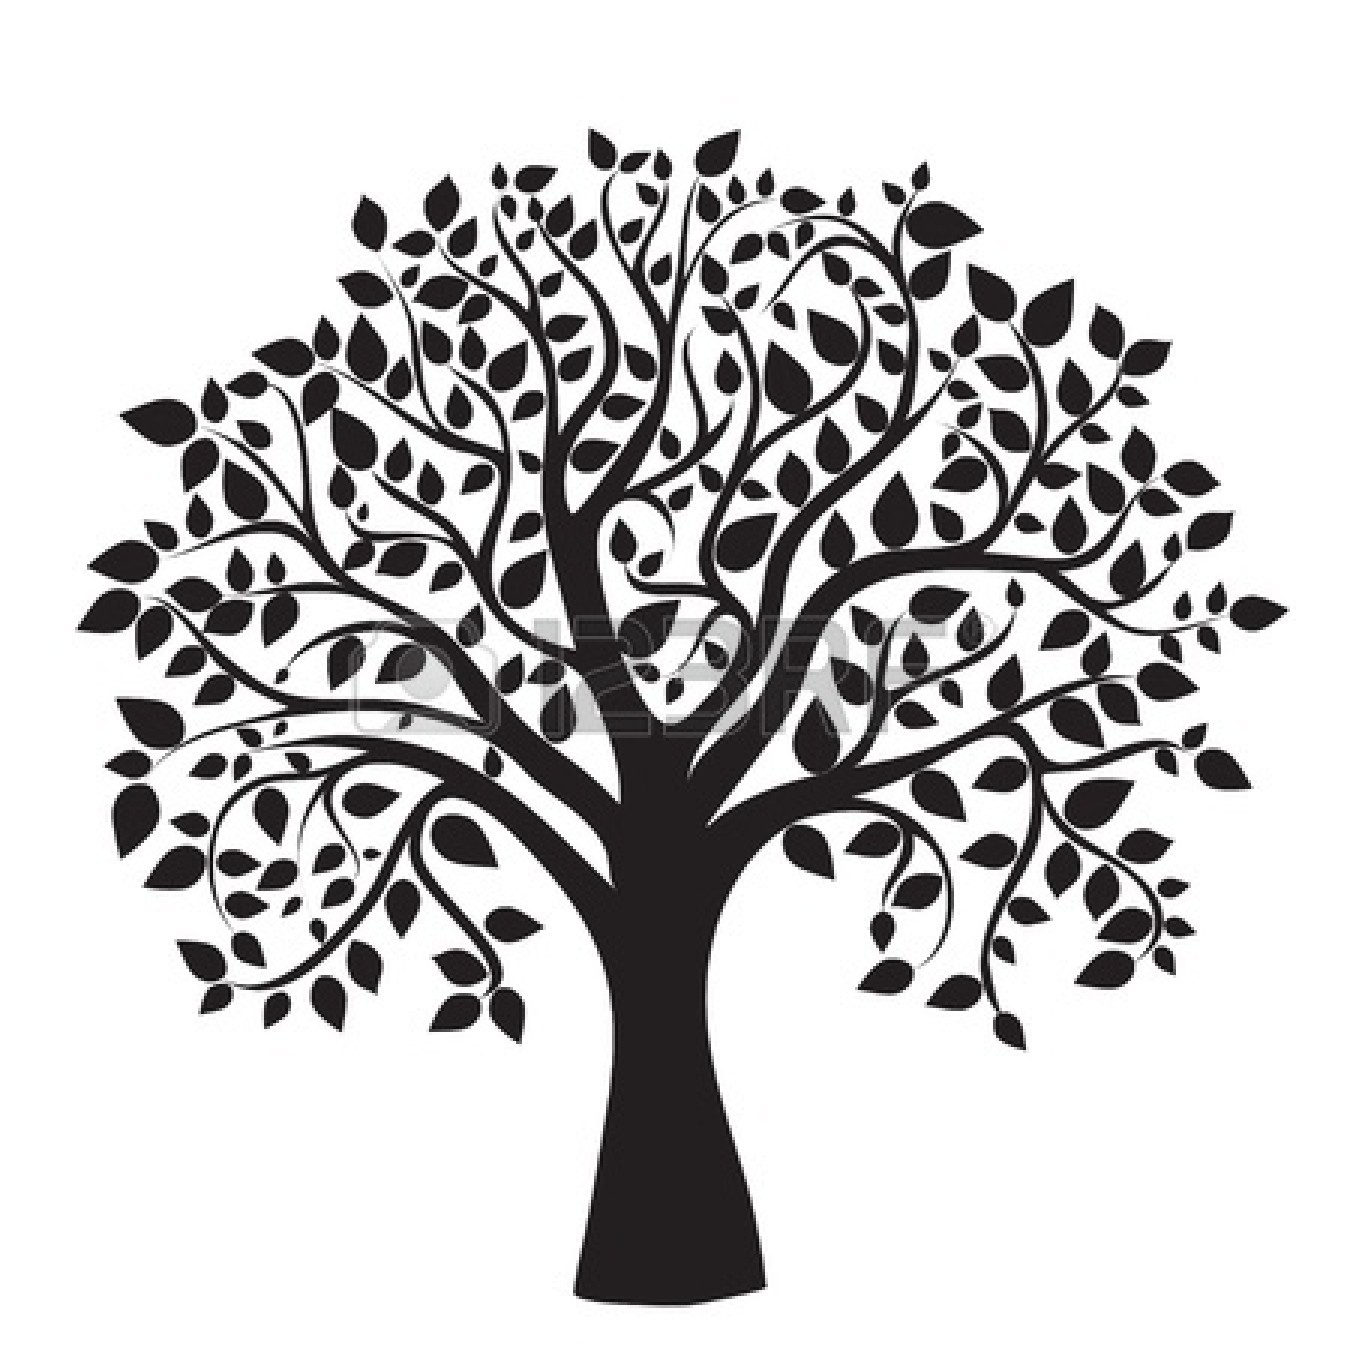 Clipart Family Tree Free Clipground